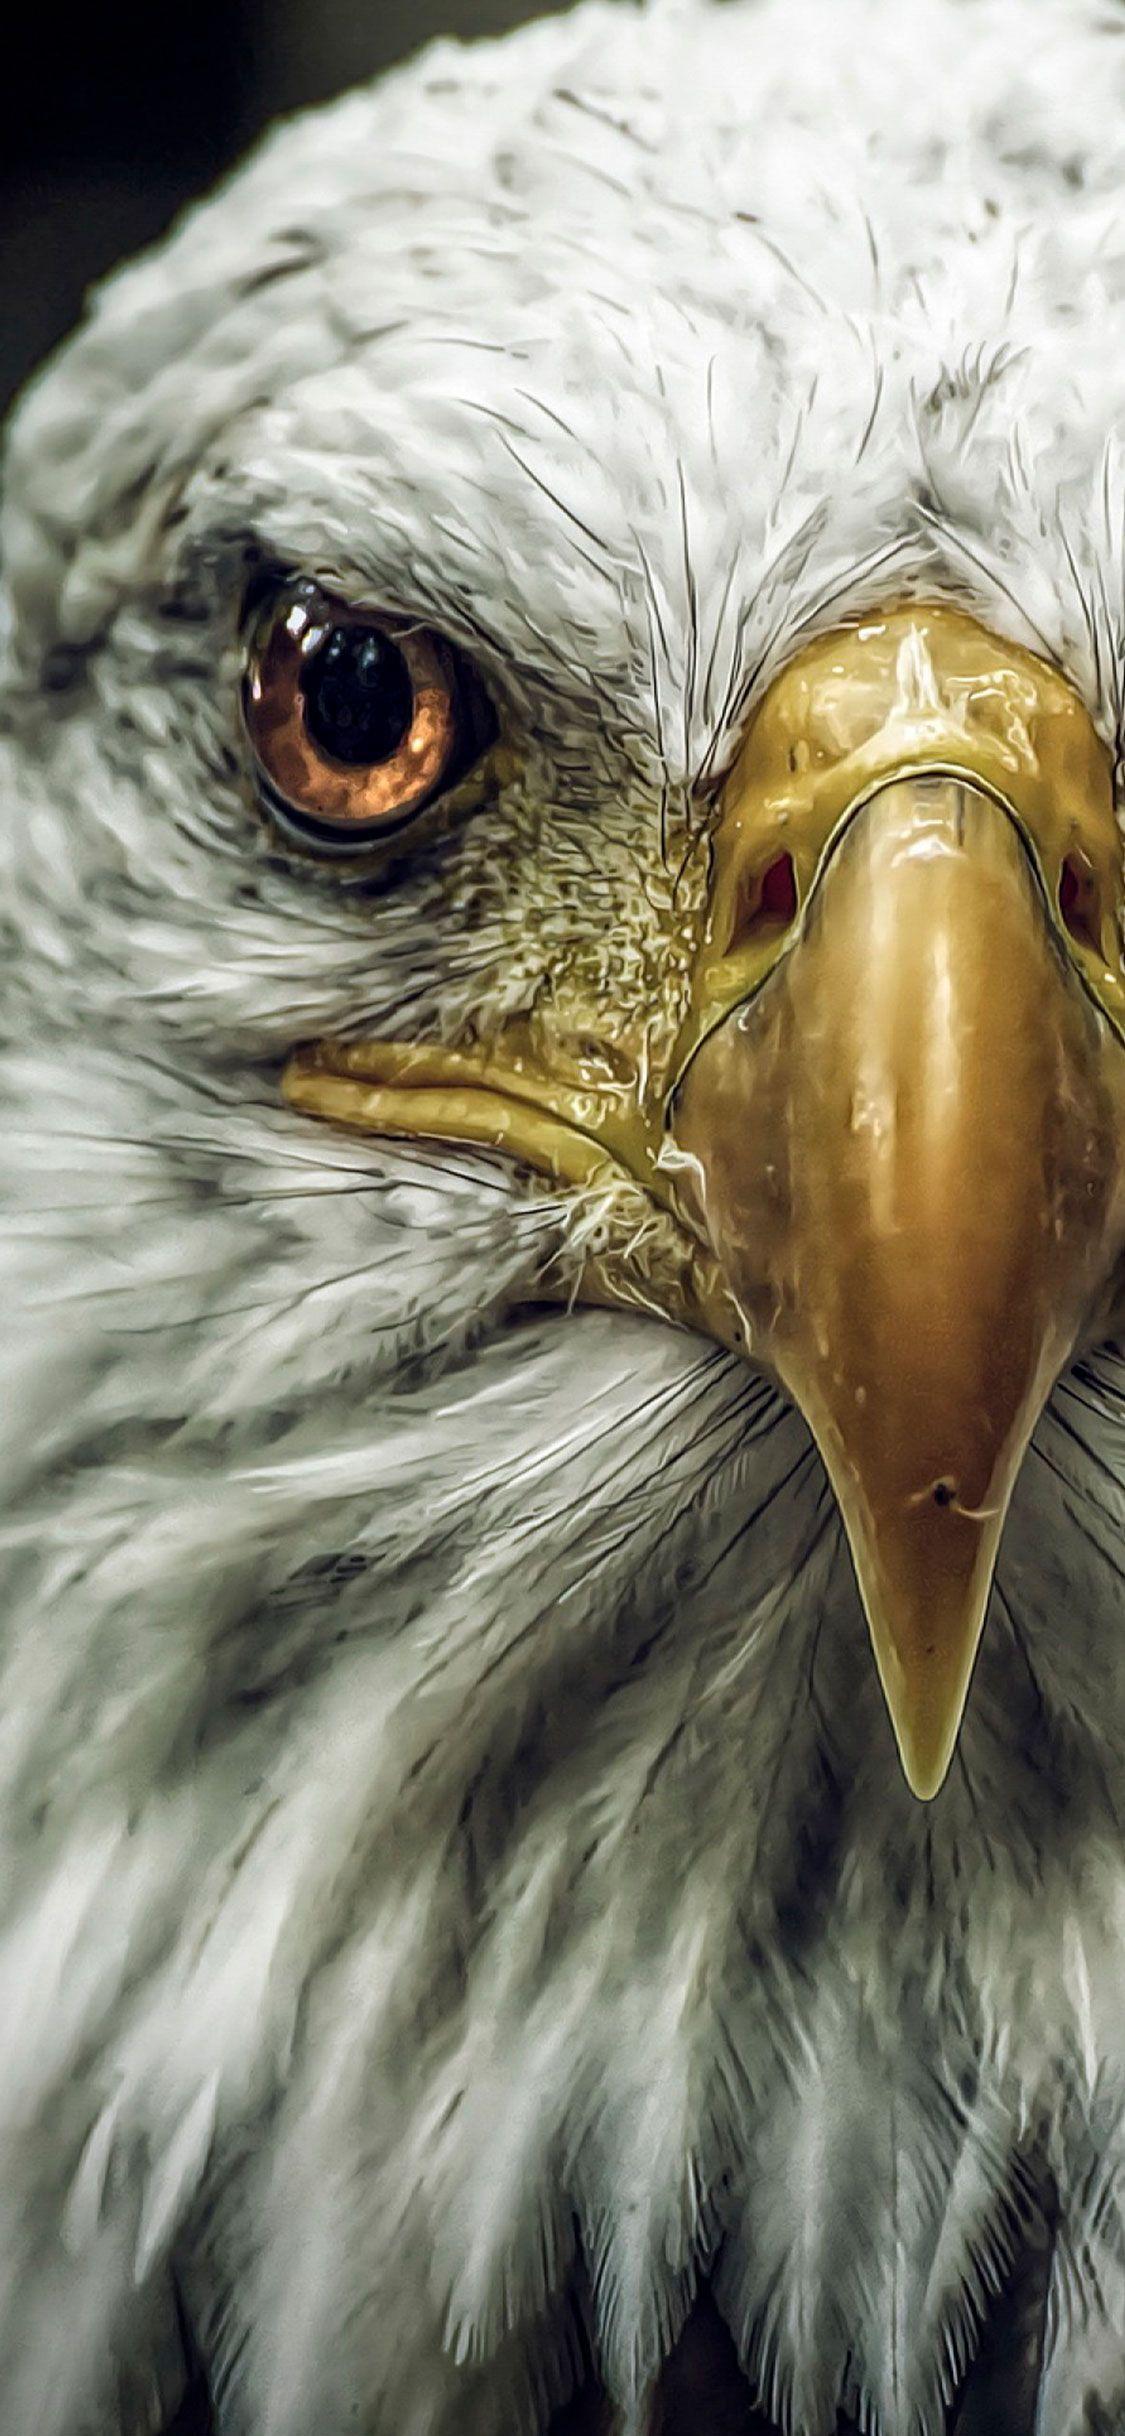 Eagle Wallpaper 4k Iphone Mywallpapers Site Eagle Wallpaper Eagle Pictures Pet Birds